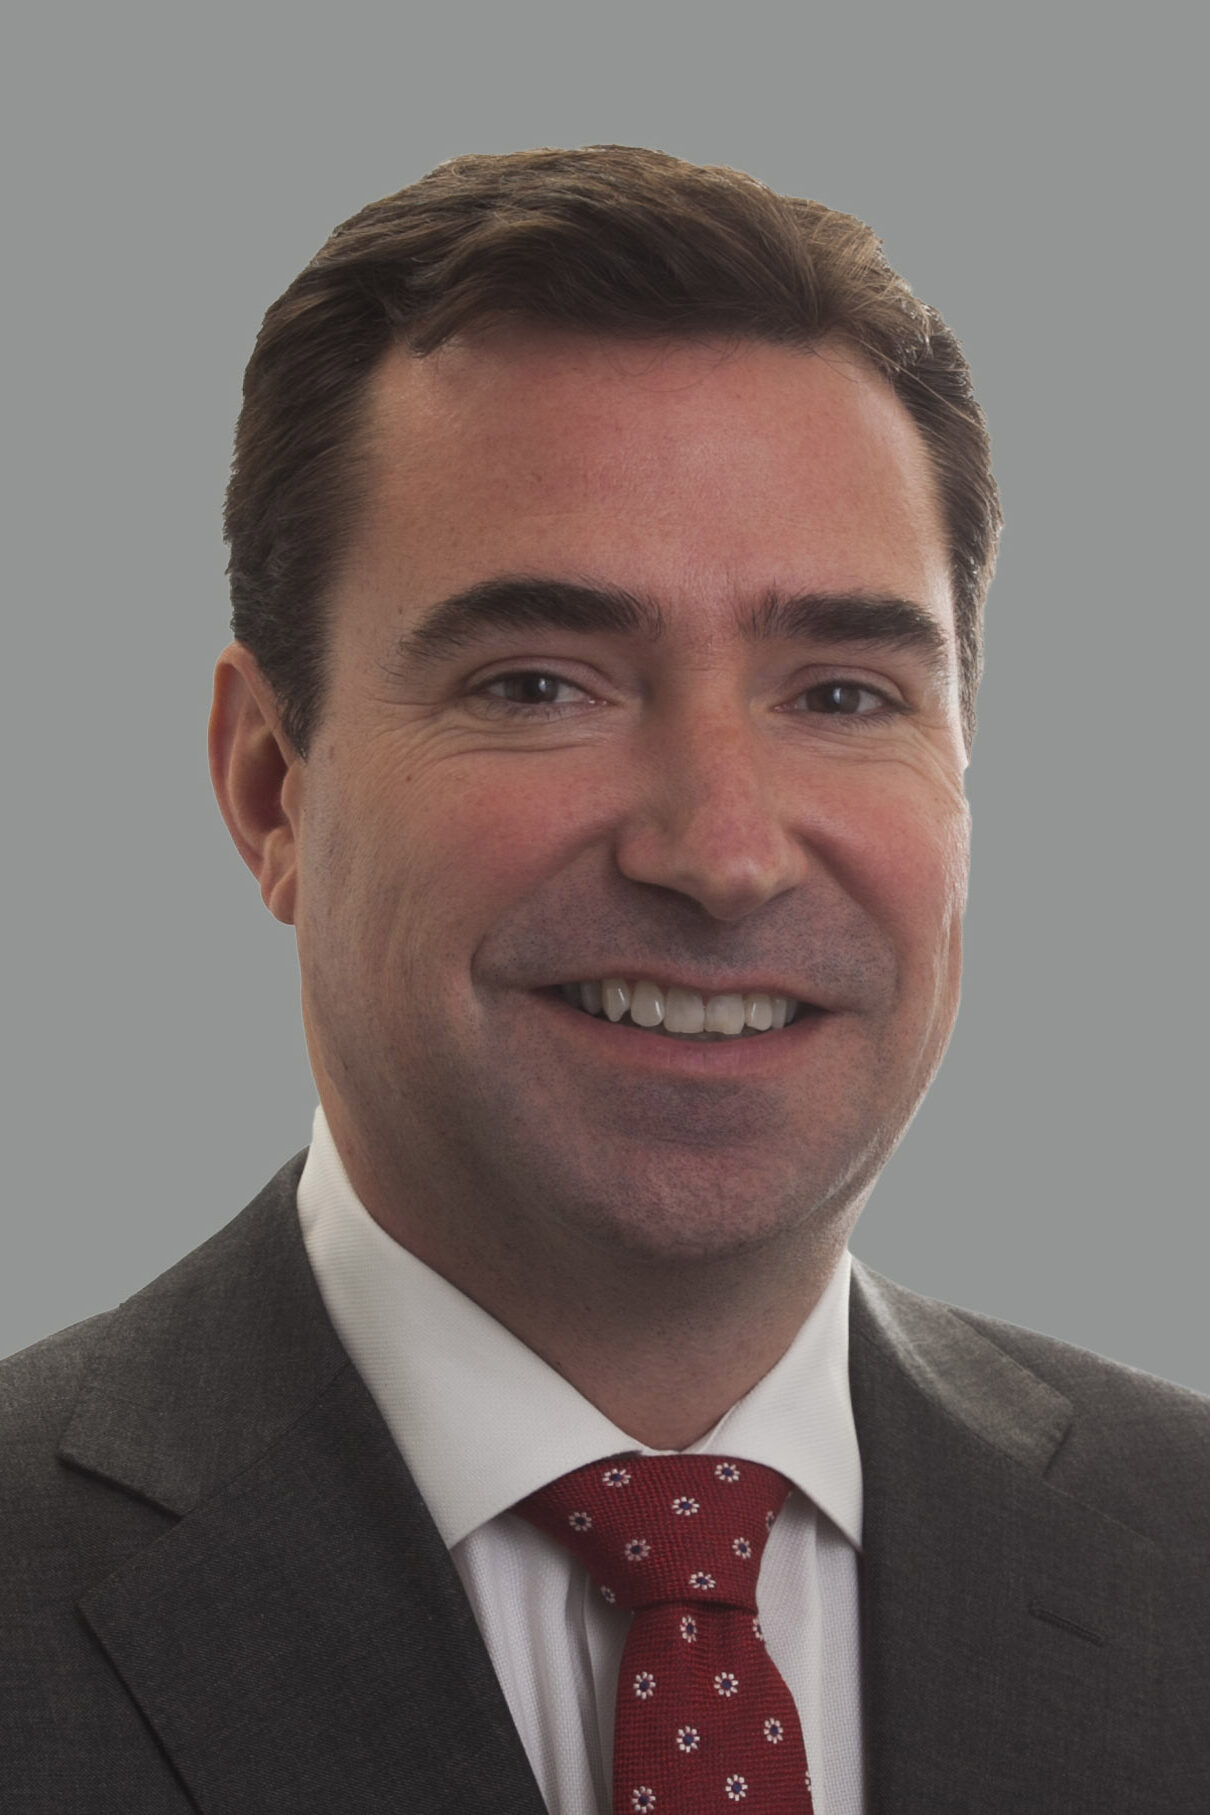 Robert Clark, CFA